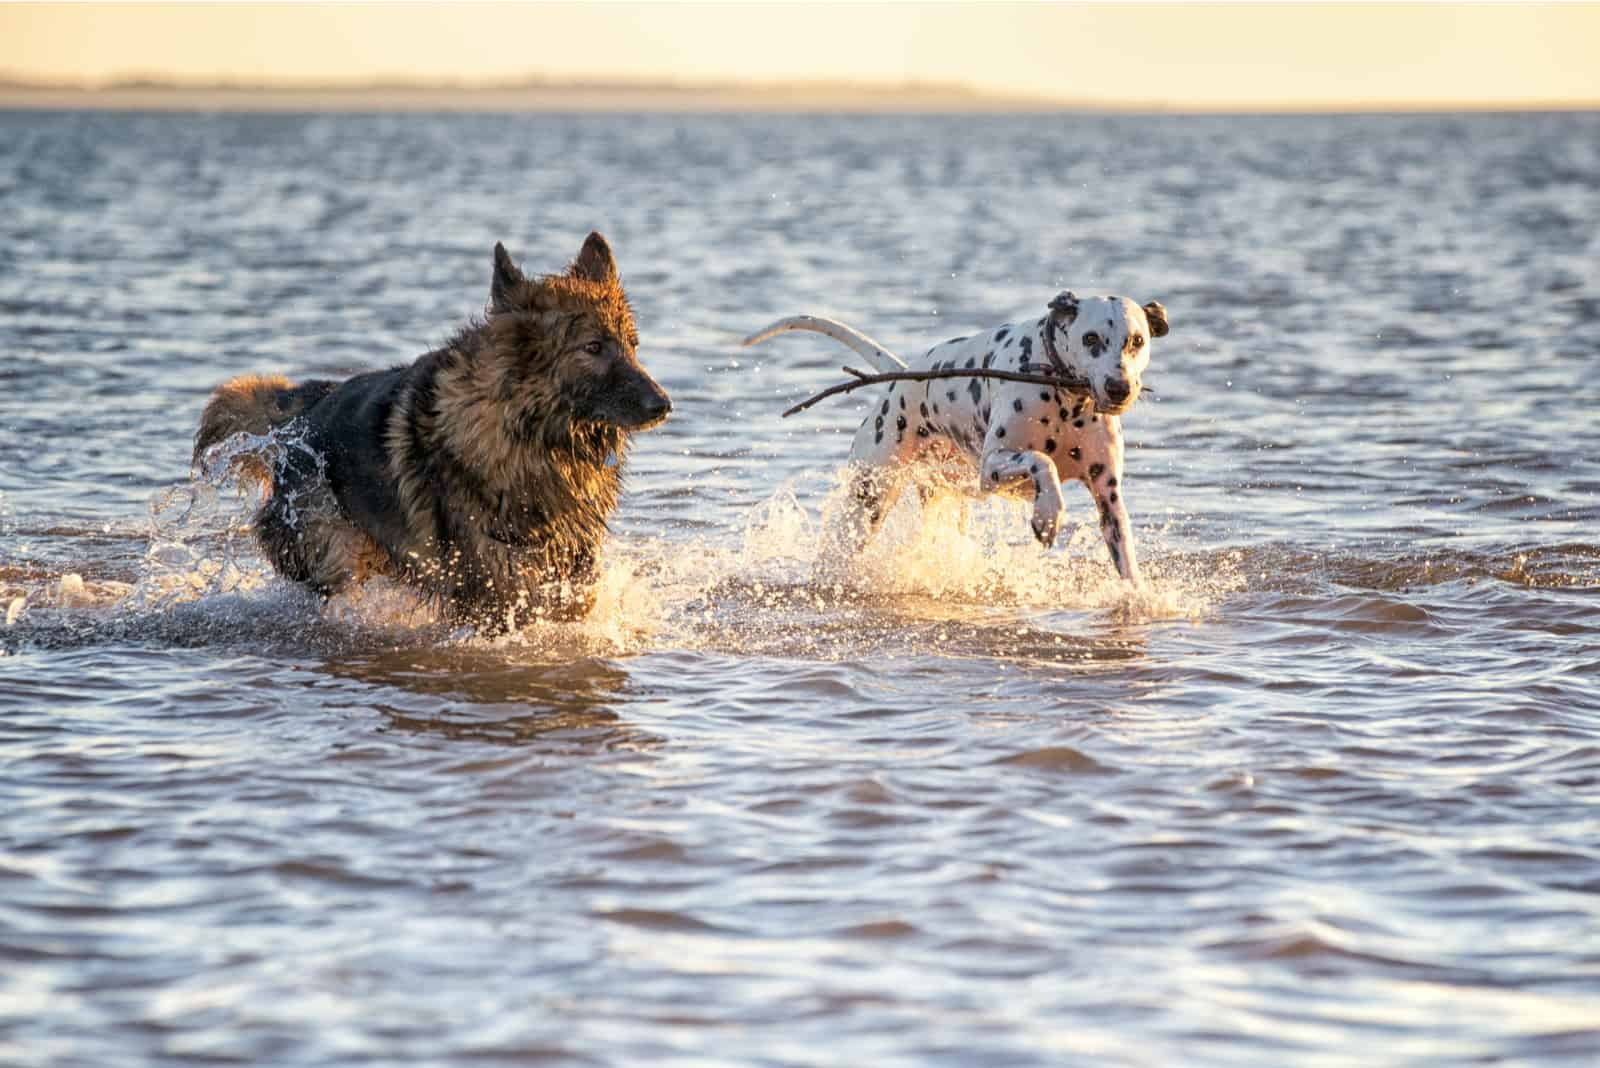 a German Shepherd and a Dalmatian run by the sea